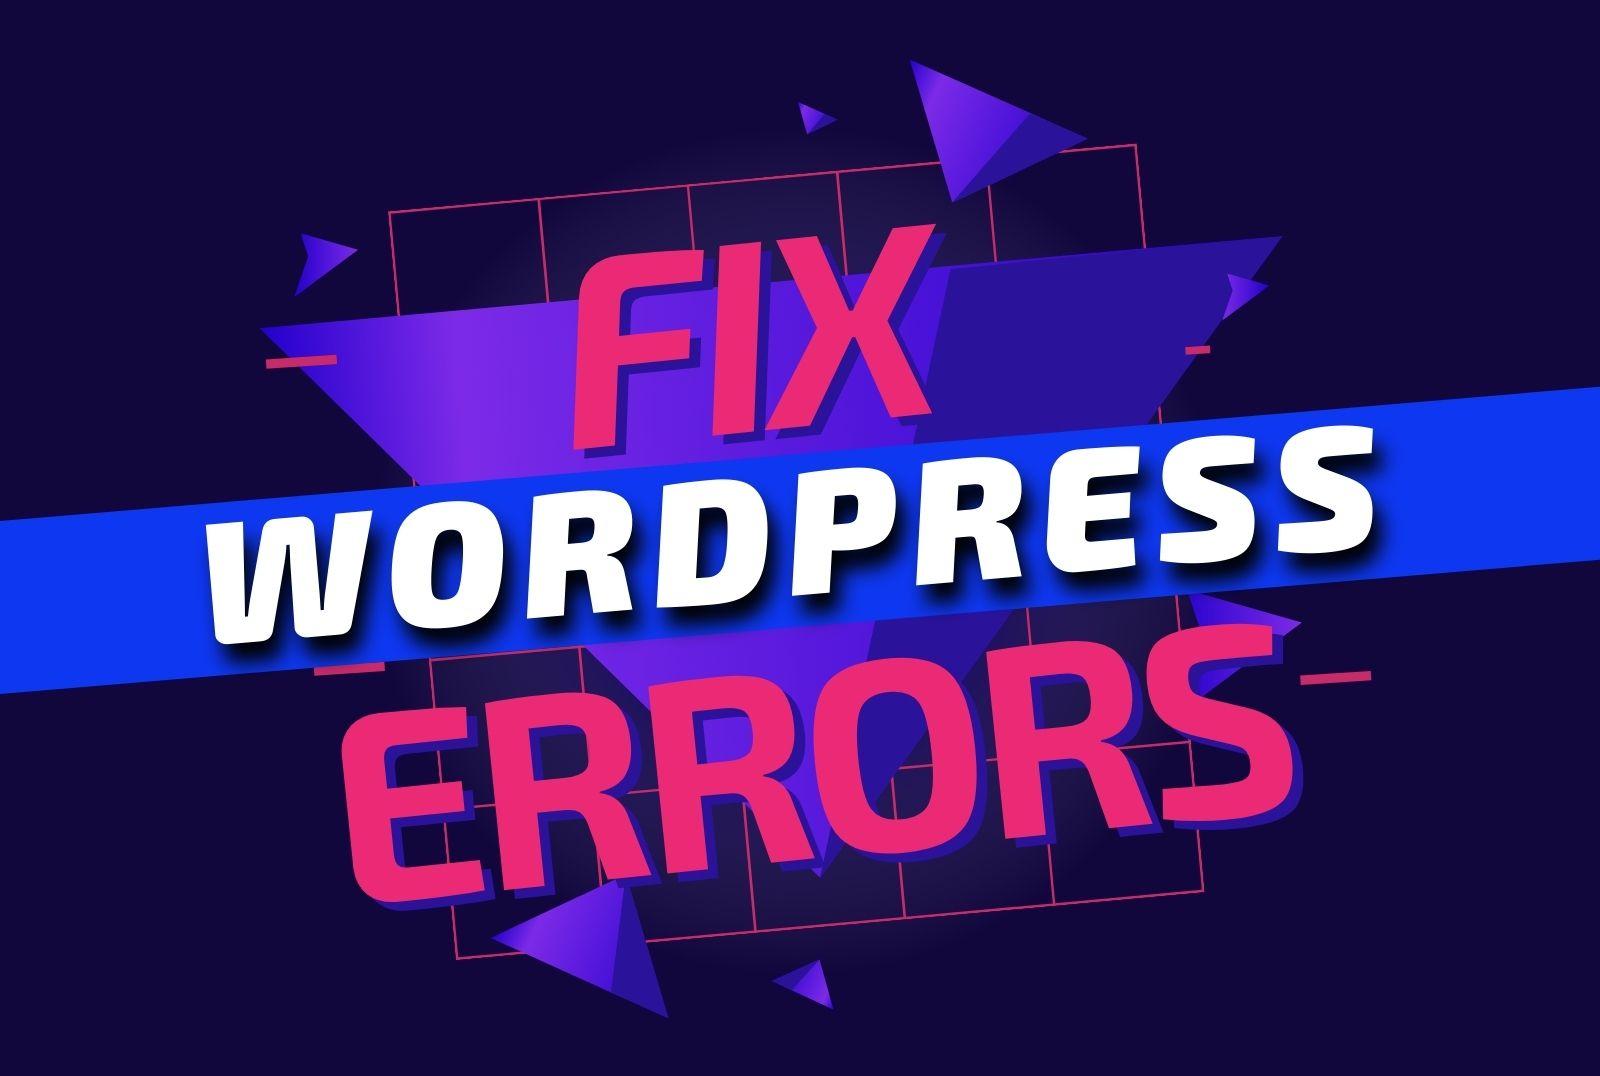 Fix wordpress issues,  errors,  bugs,  css or html coding error